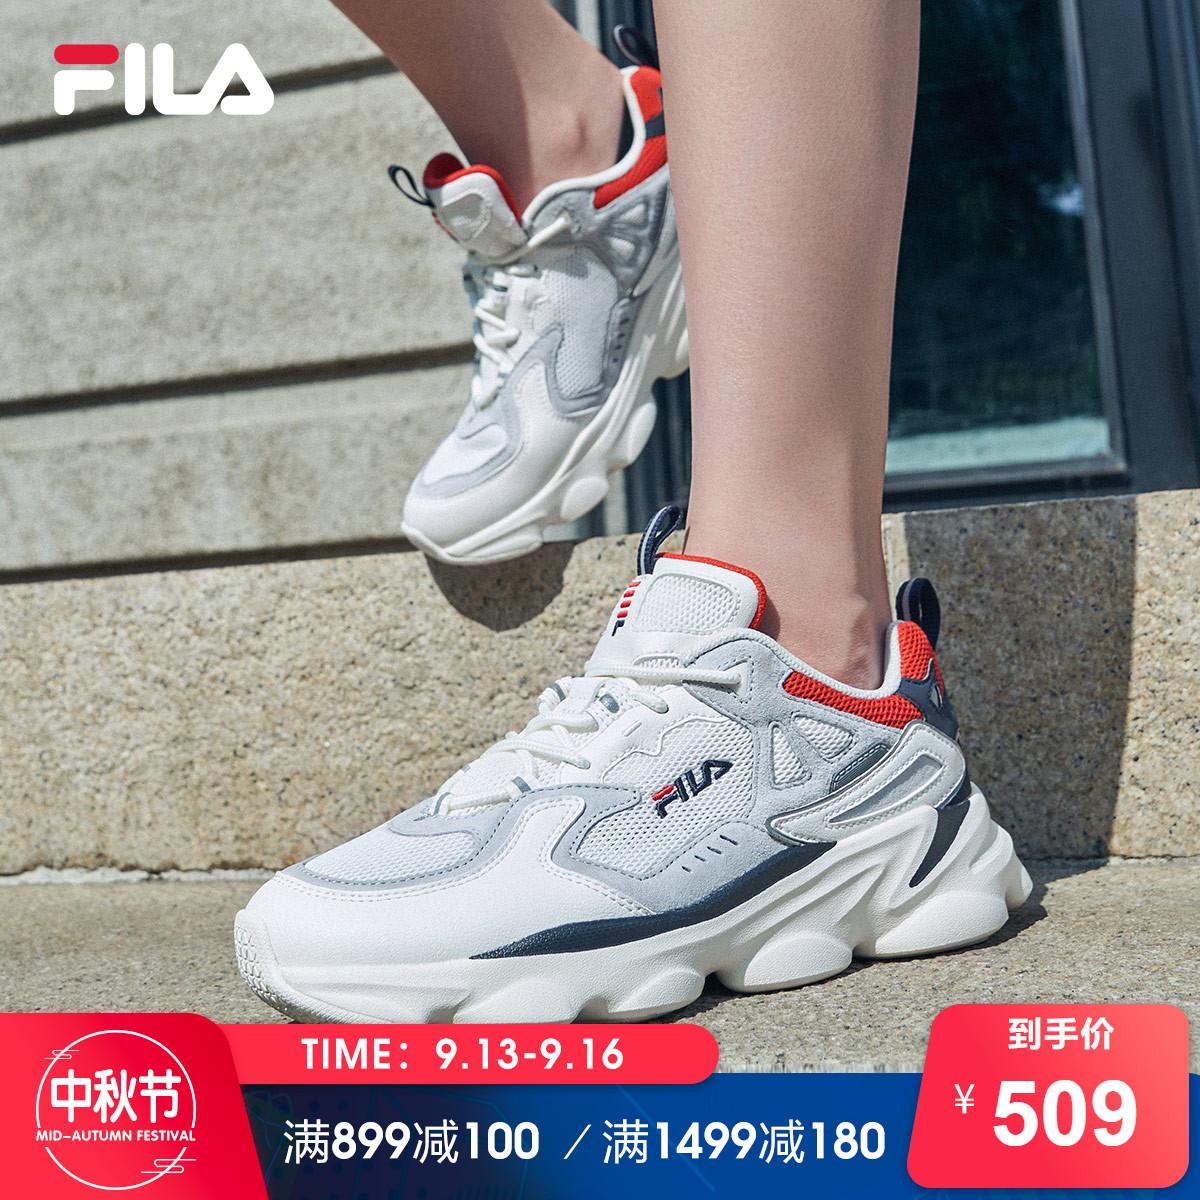 FILA Fila old shoes men and women